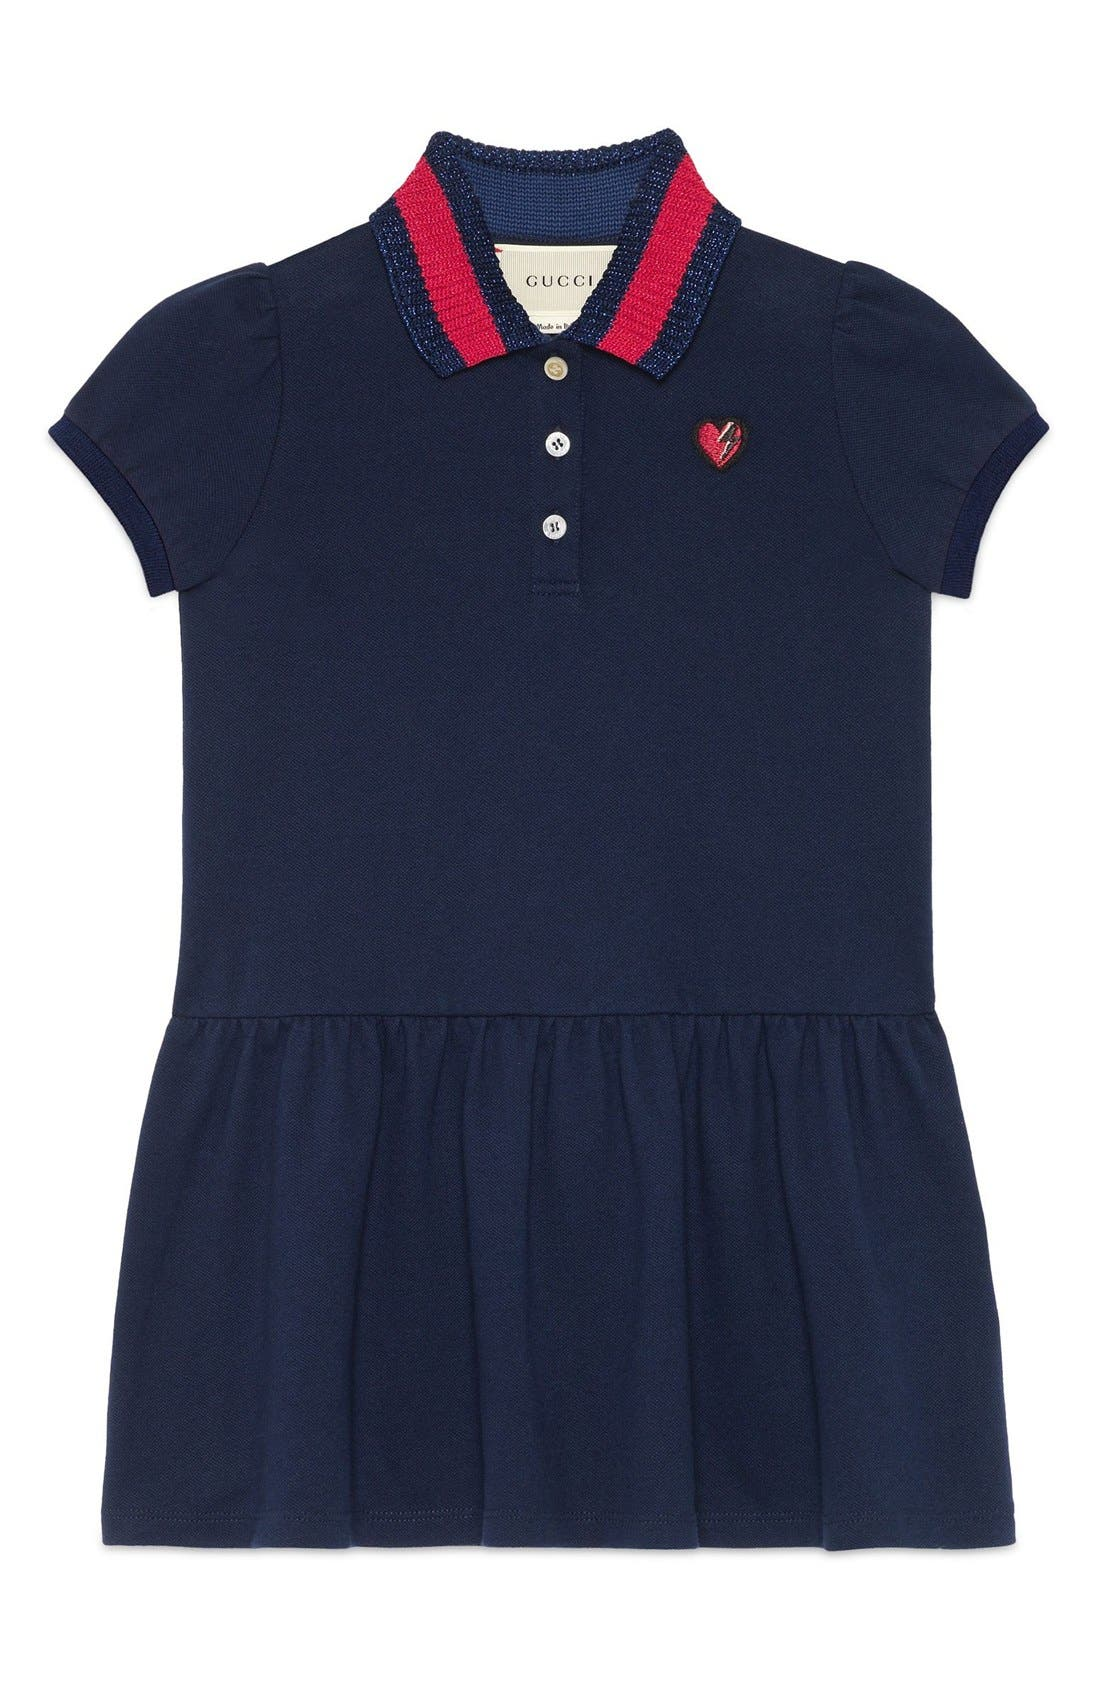 Gucci Embroidered Dress (Little Girls & Big Girls)